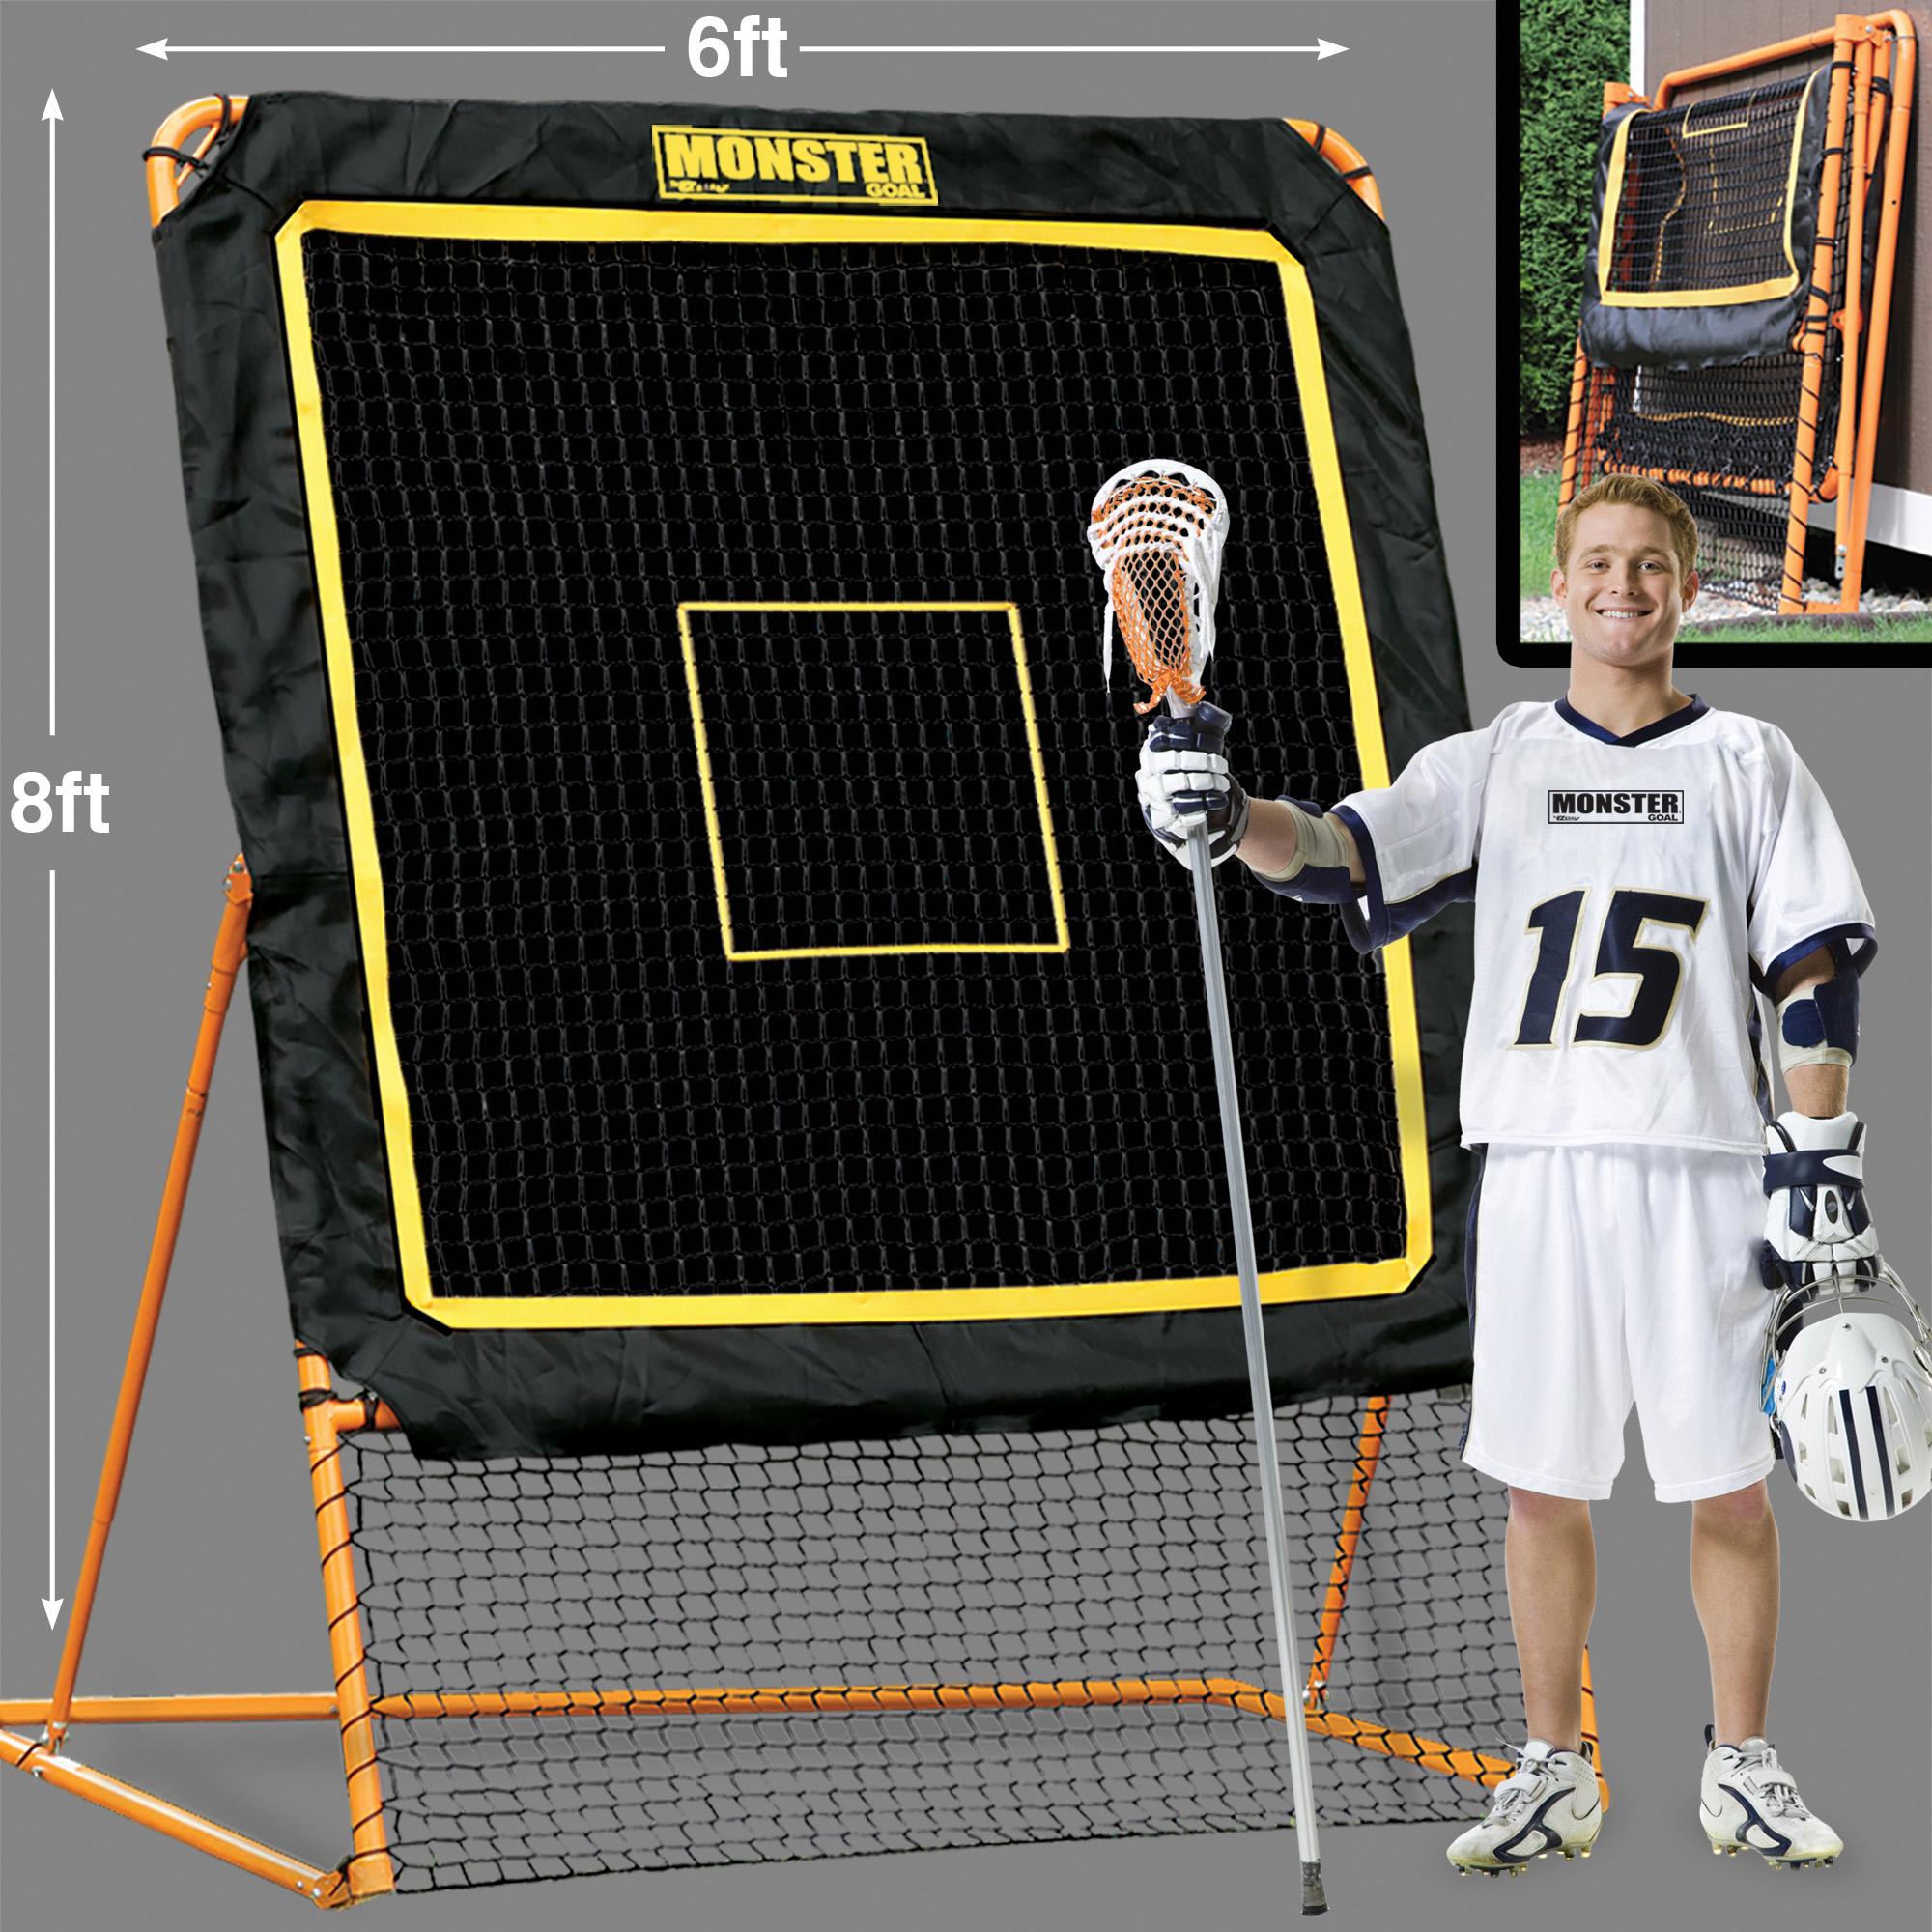 EZ Goal Lacrosse Professional Practice Rebounder